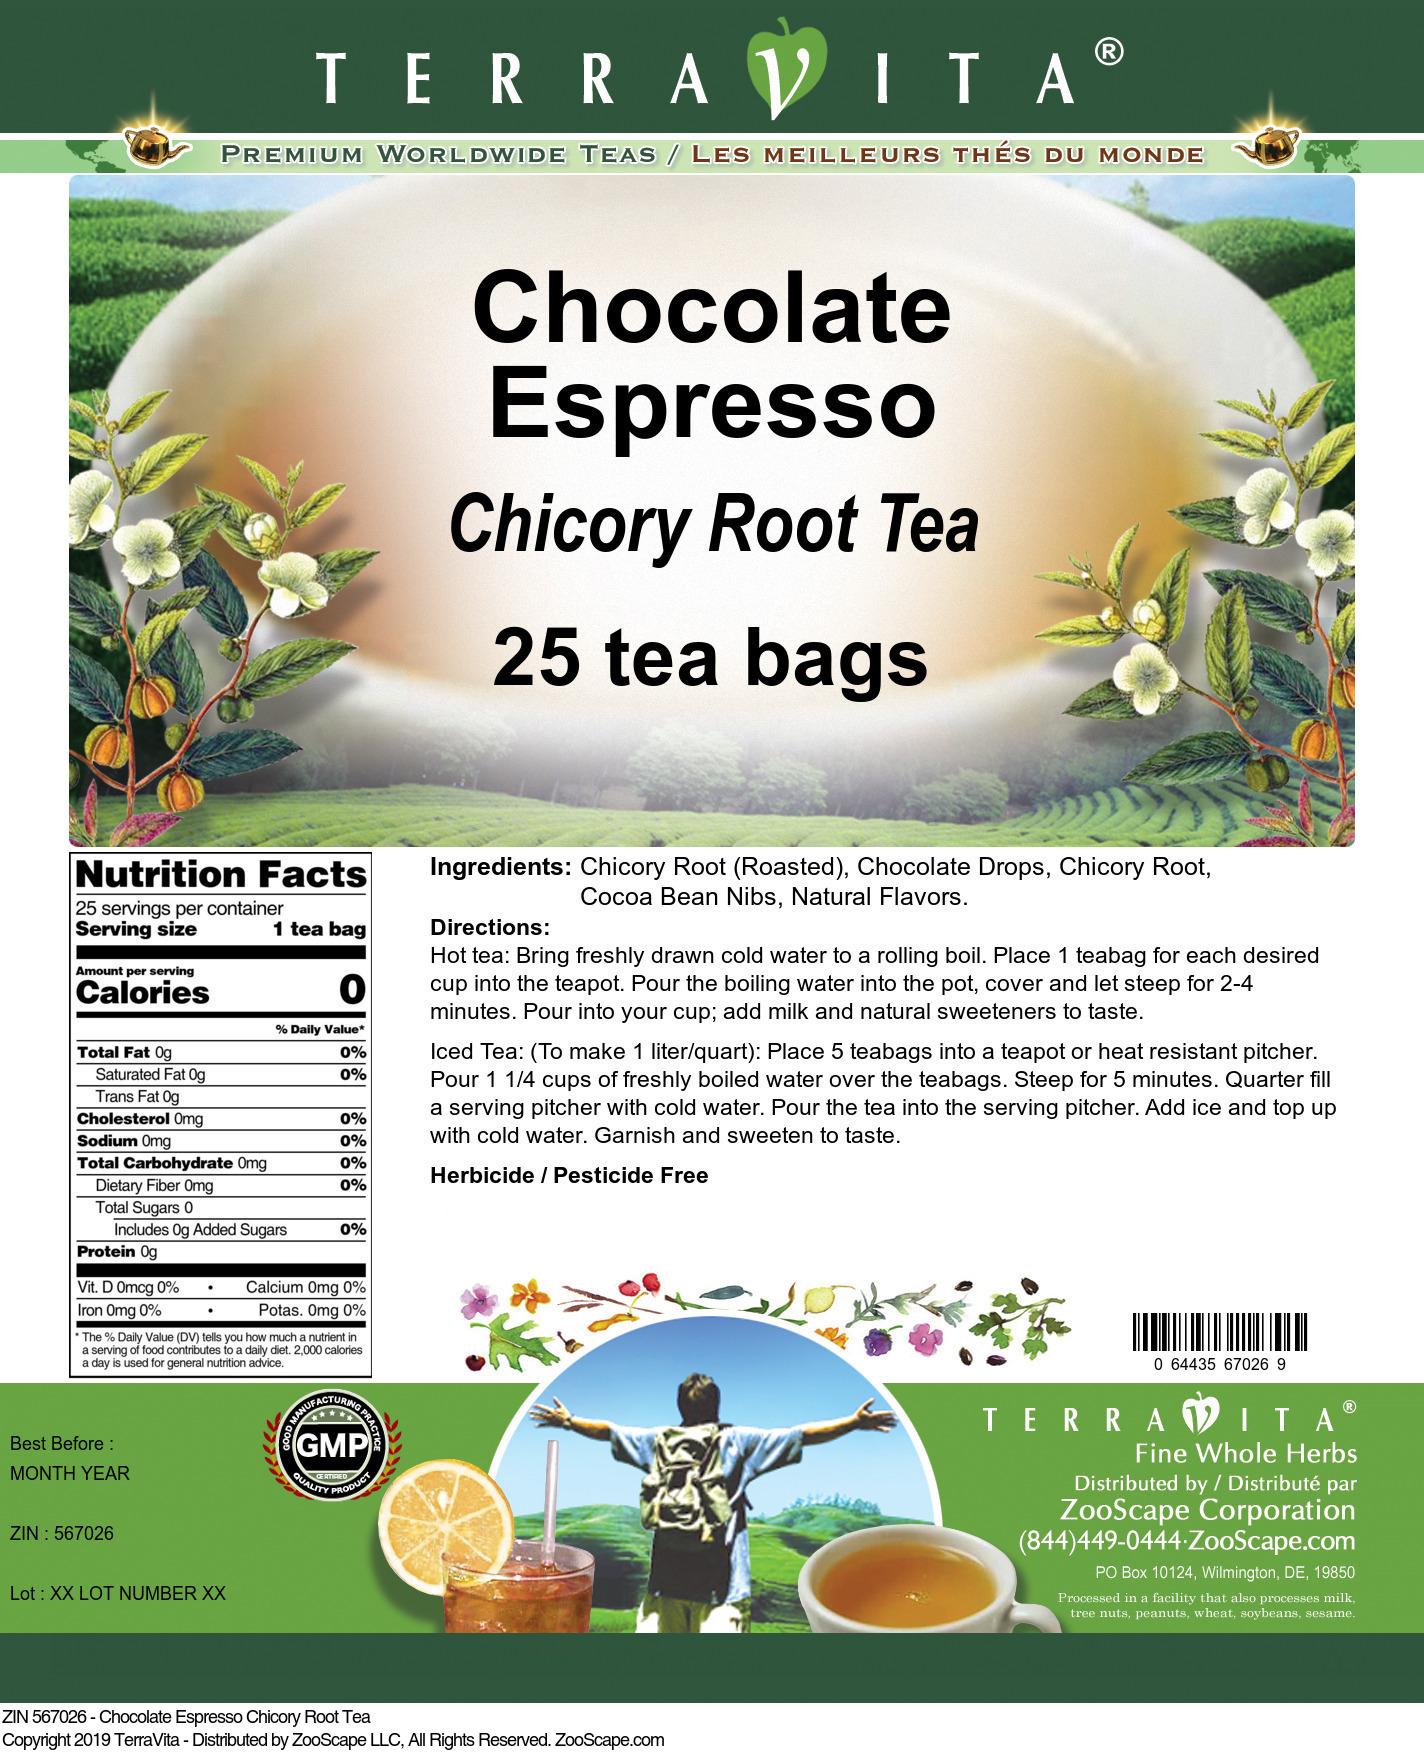 Chocolate Espresso Chicory Root